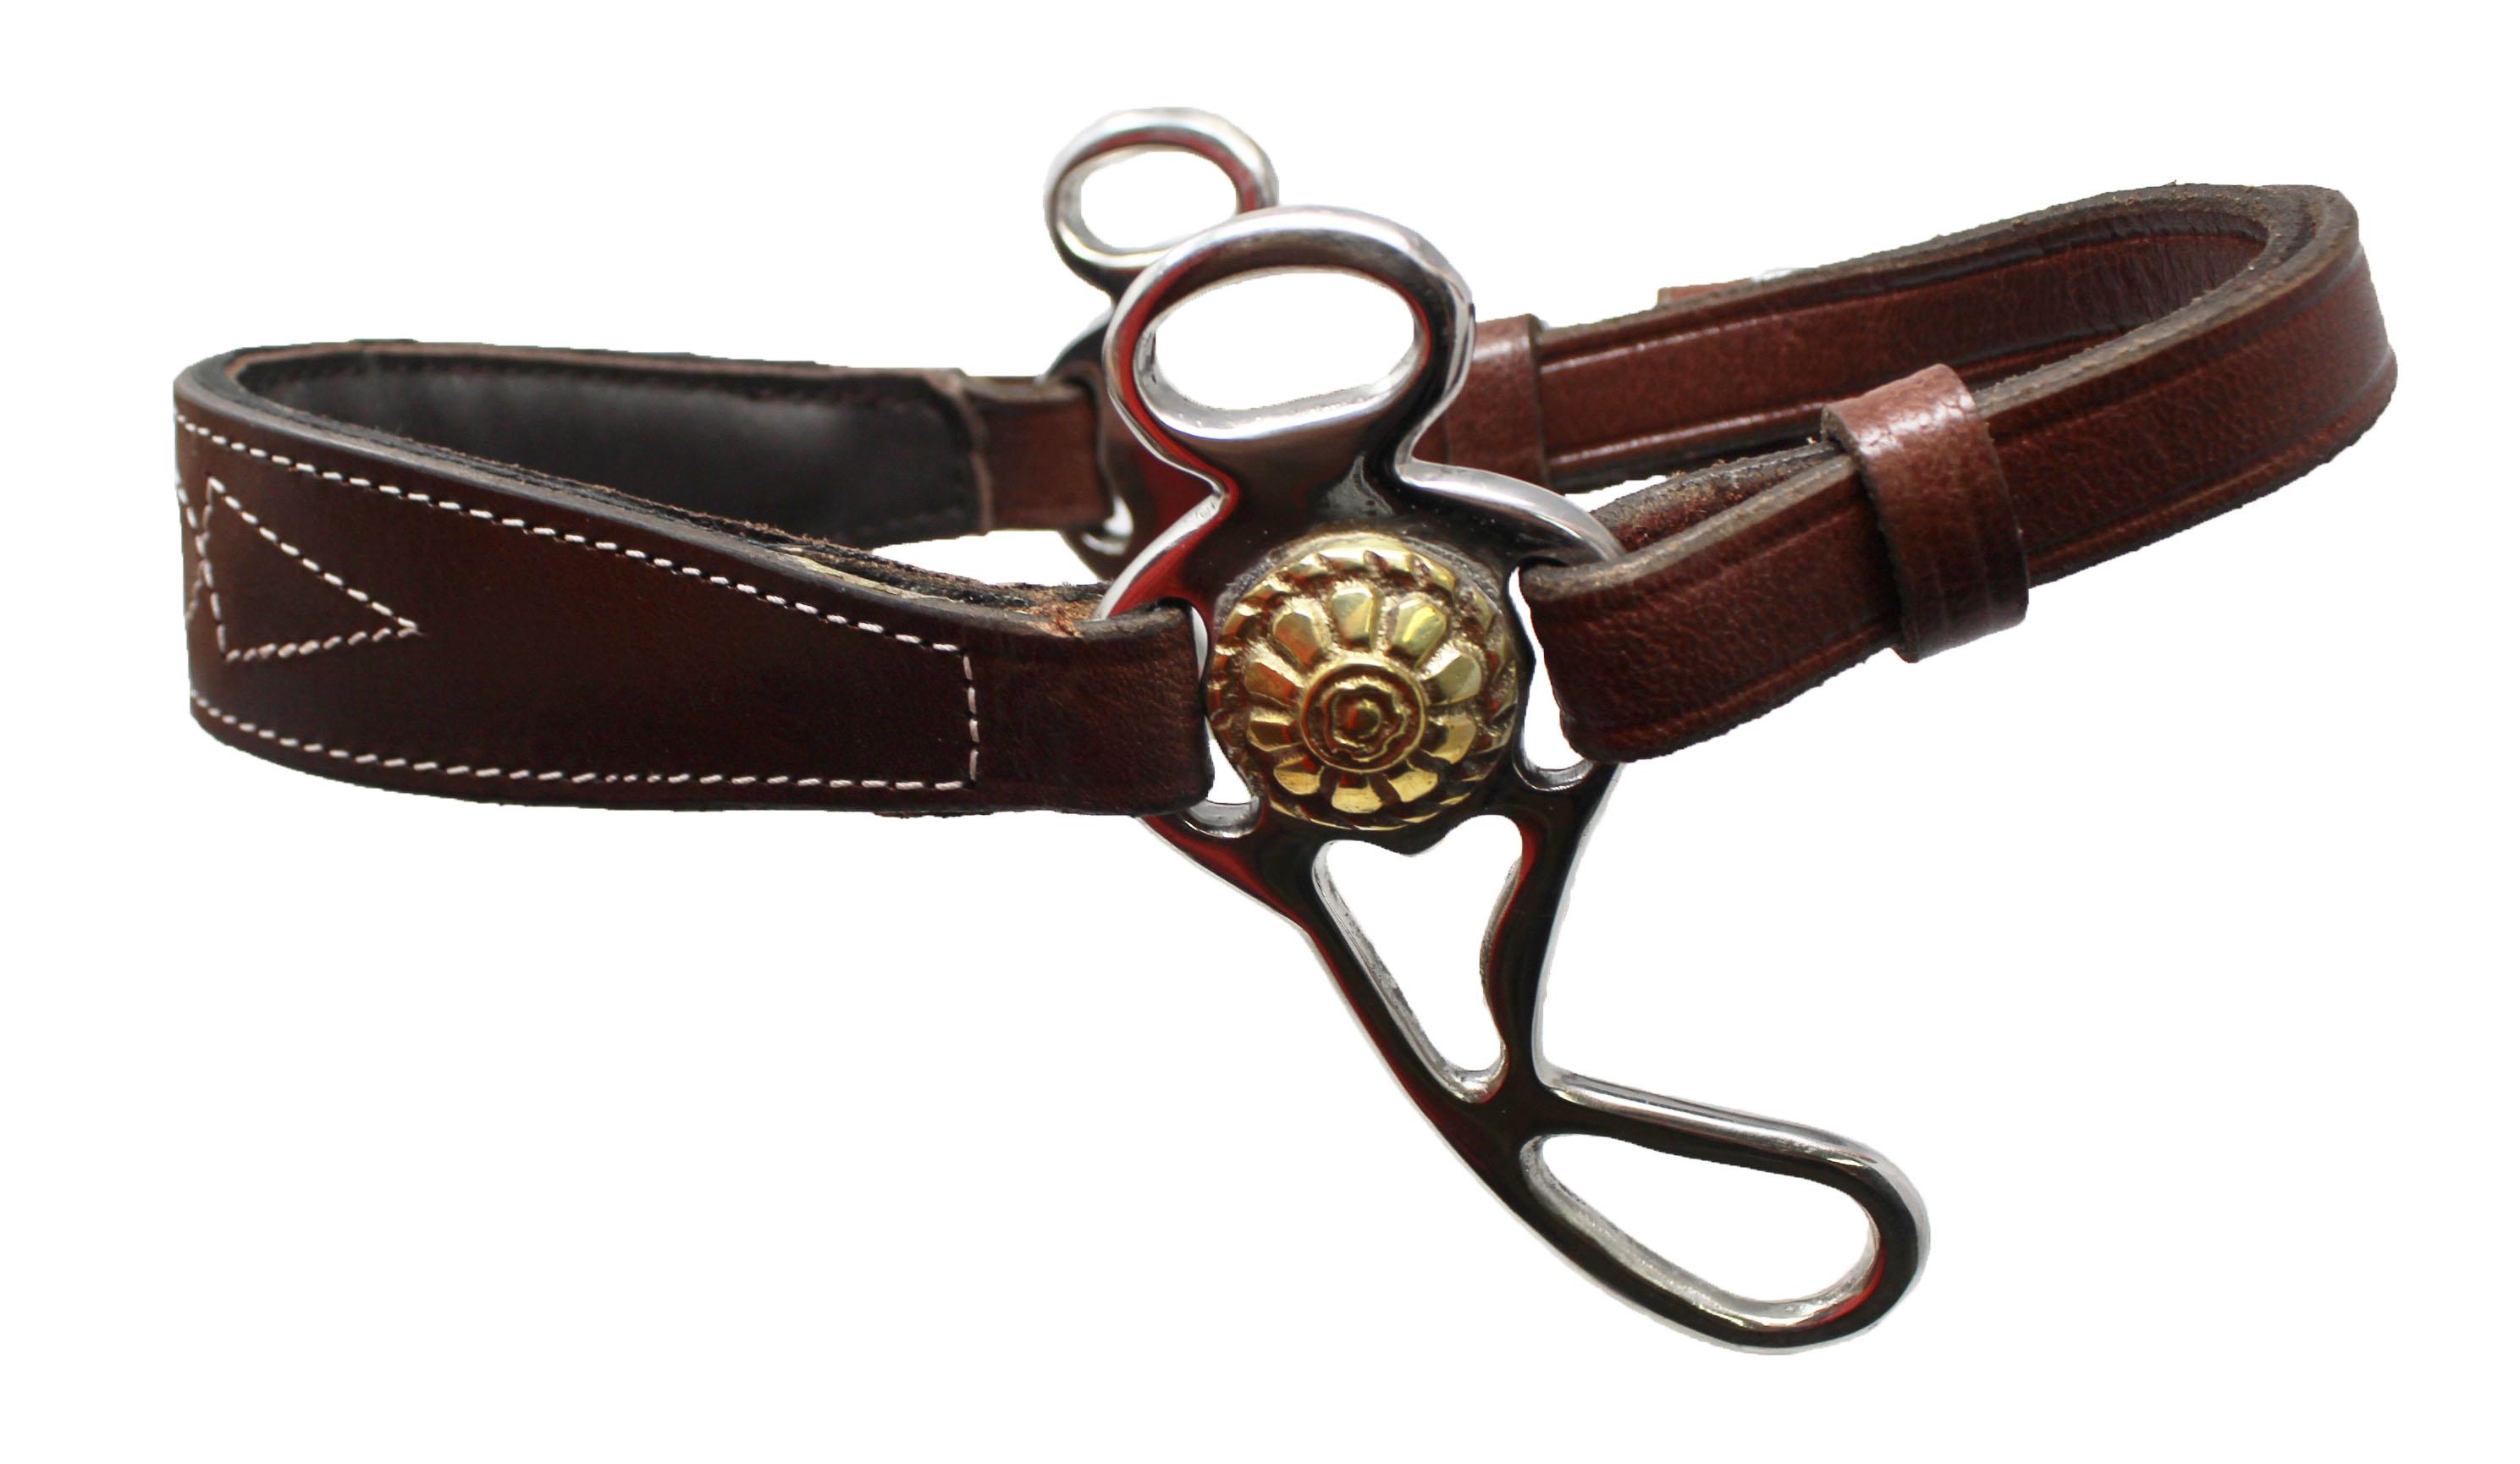 BROWN Hackamore Bitless Horse Bit English Western Adjustable Leather